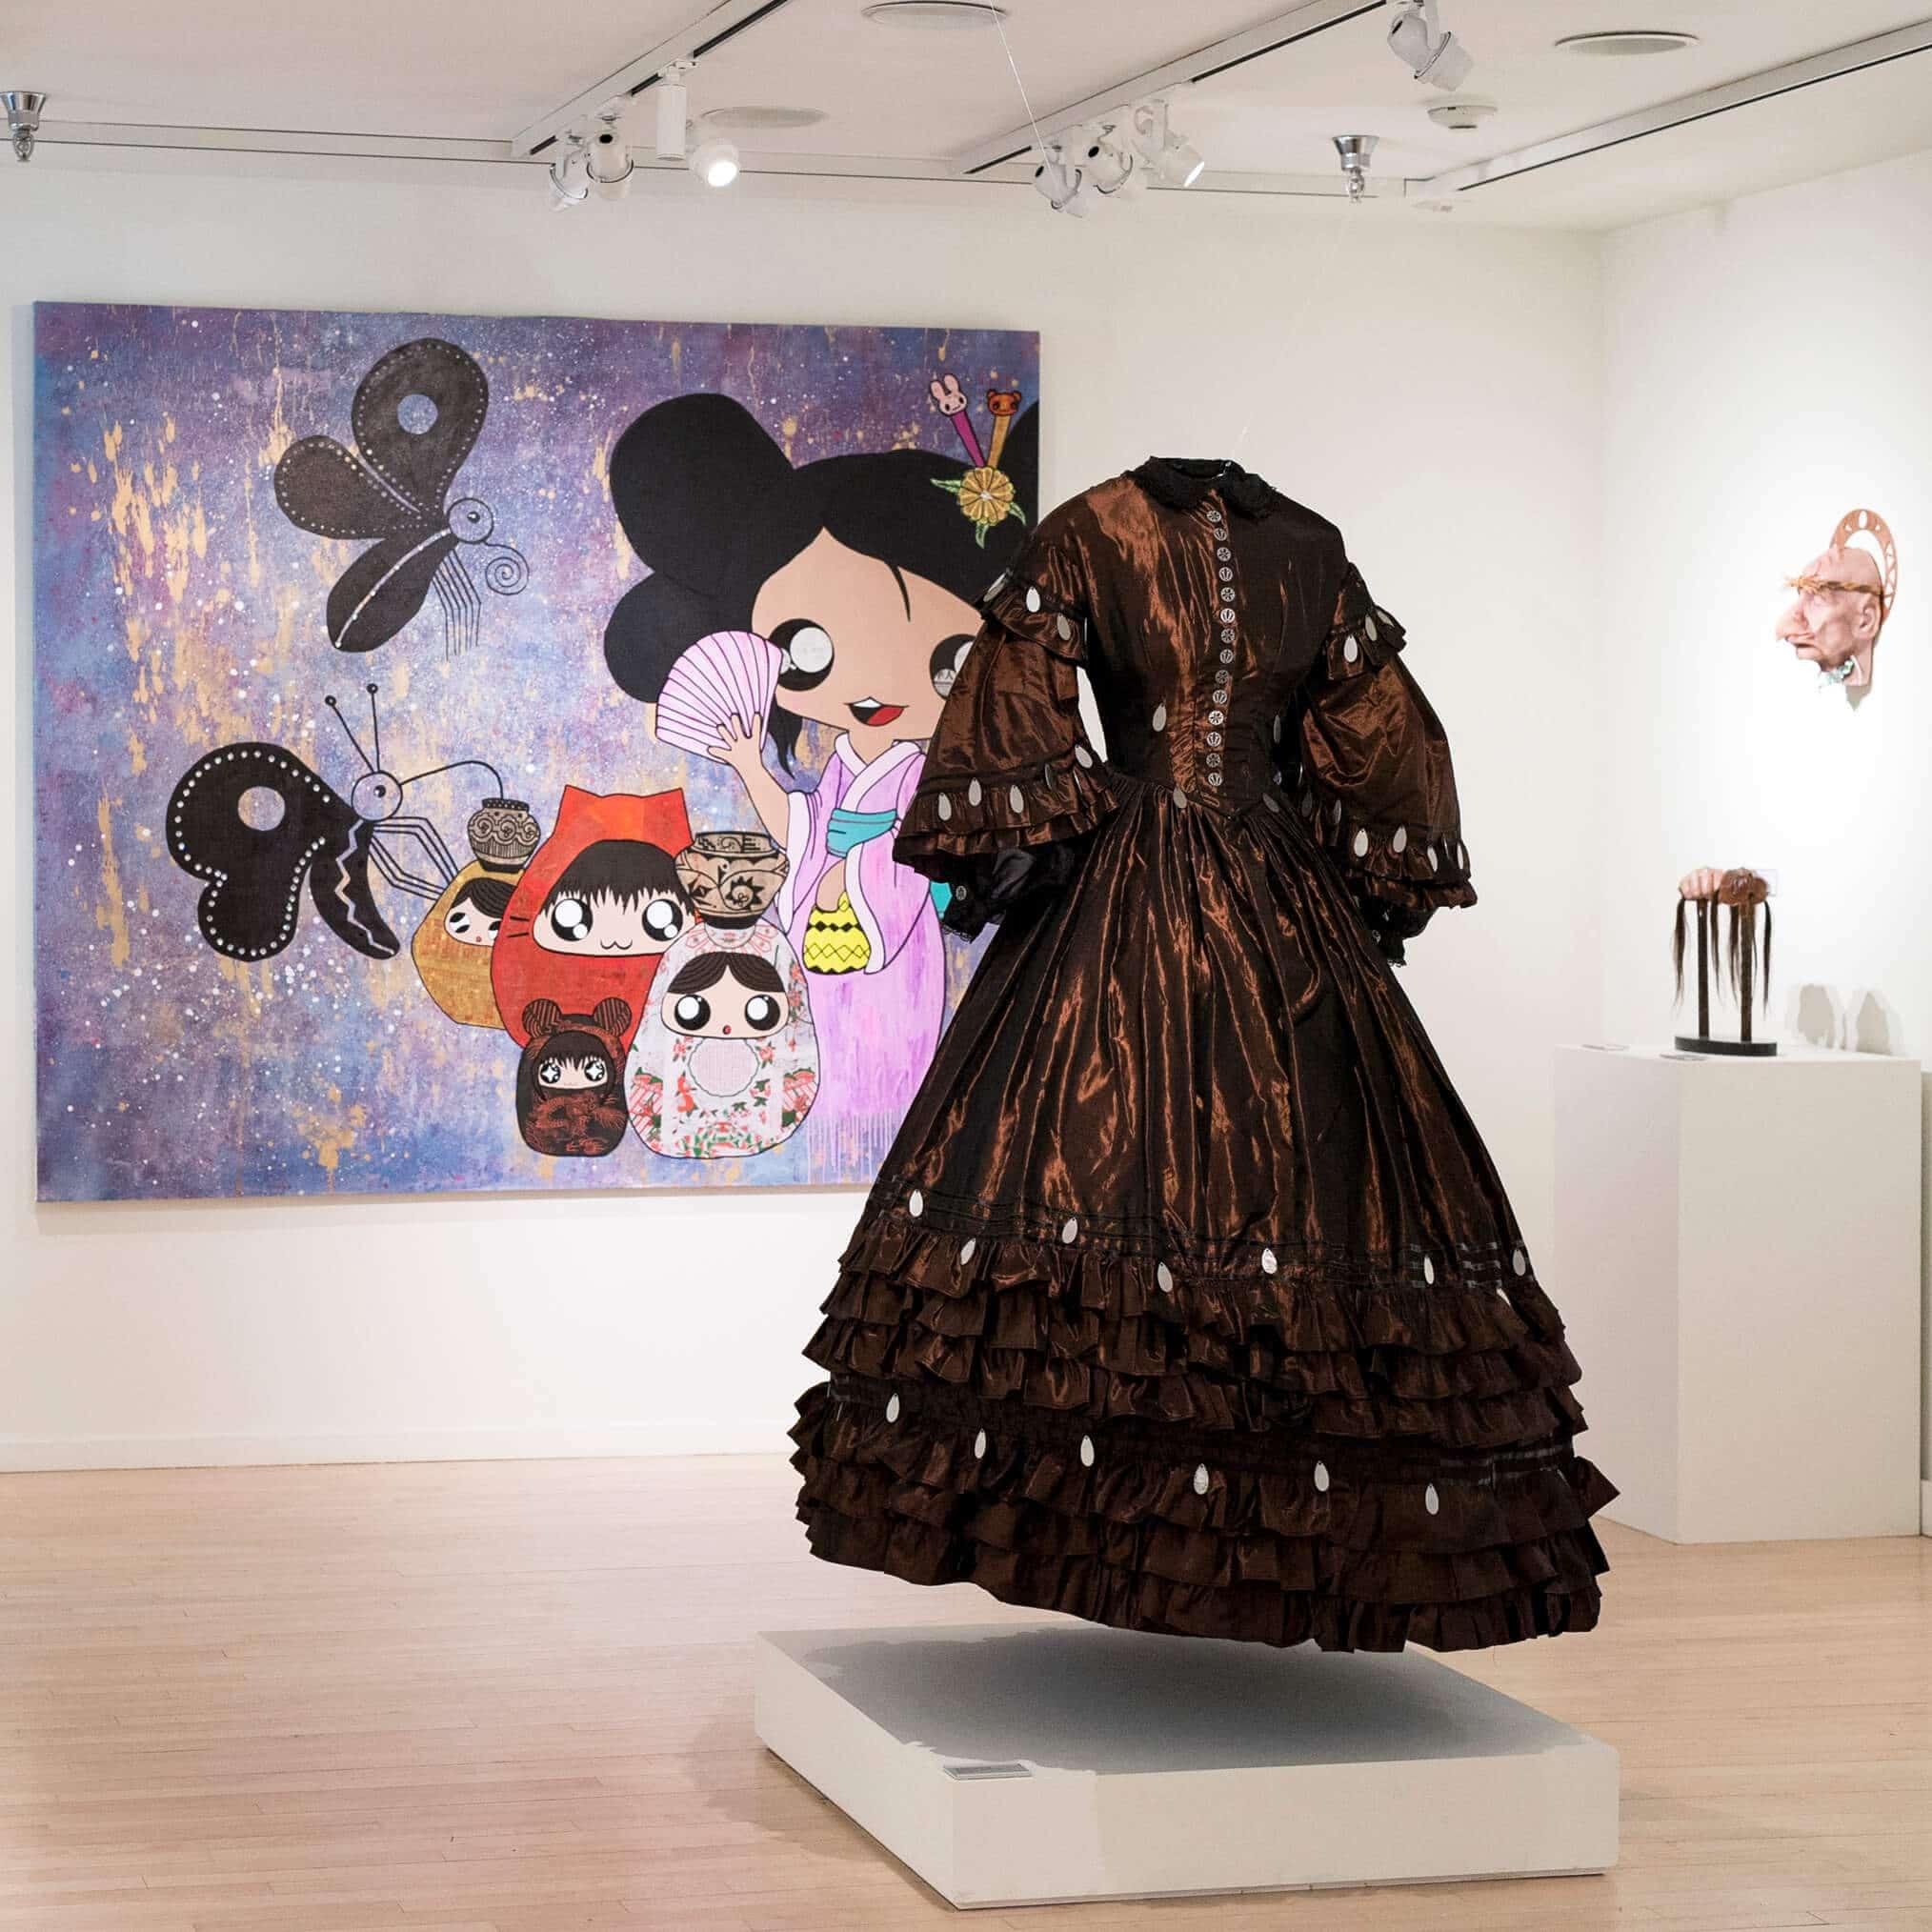 Exhibitions > Institute Of American Indian Arts (IAIA